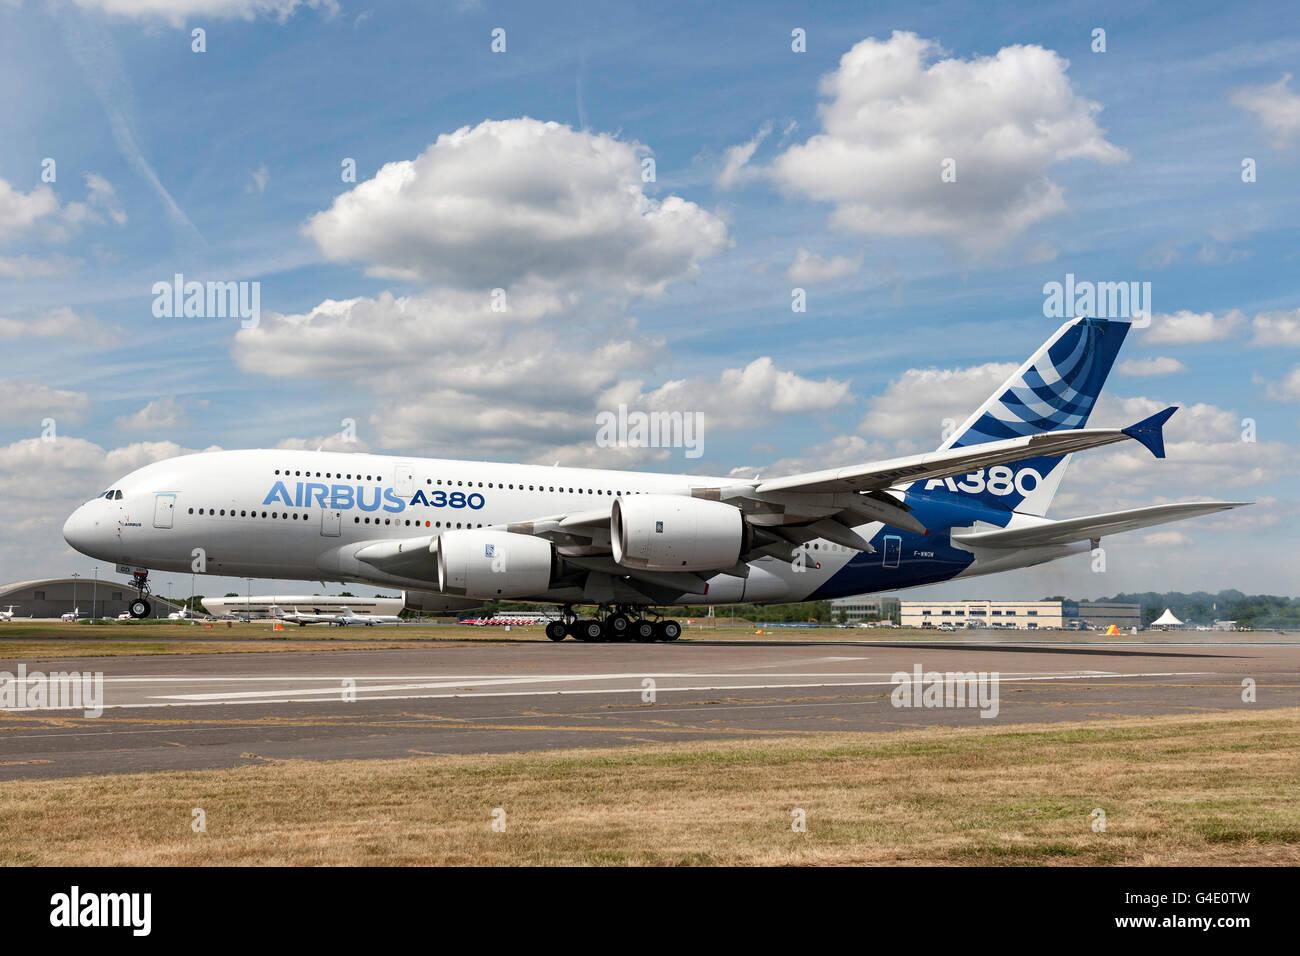 Airbus A380-841 F-WWOW displaying at the Farnborough International Airshow - Stock Image